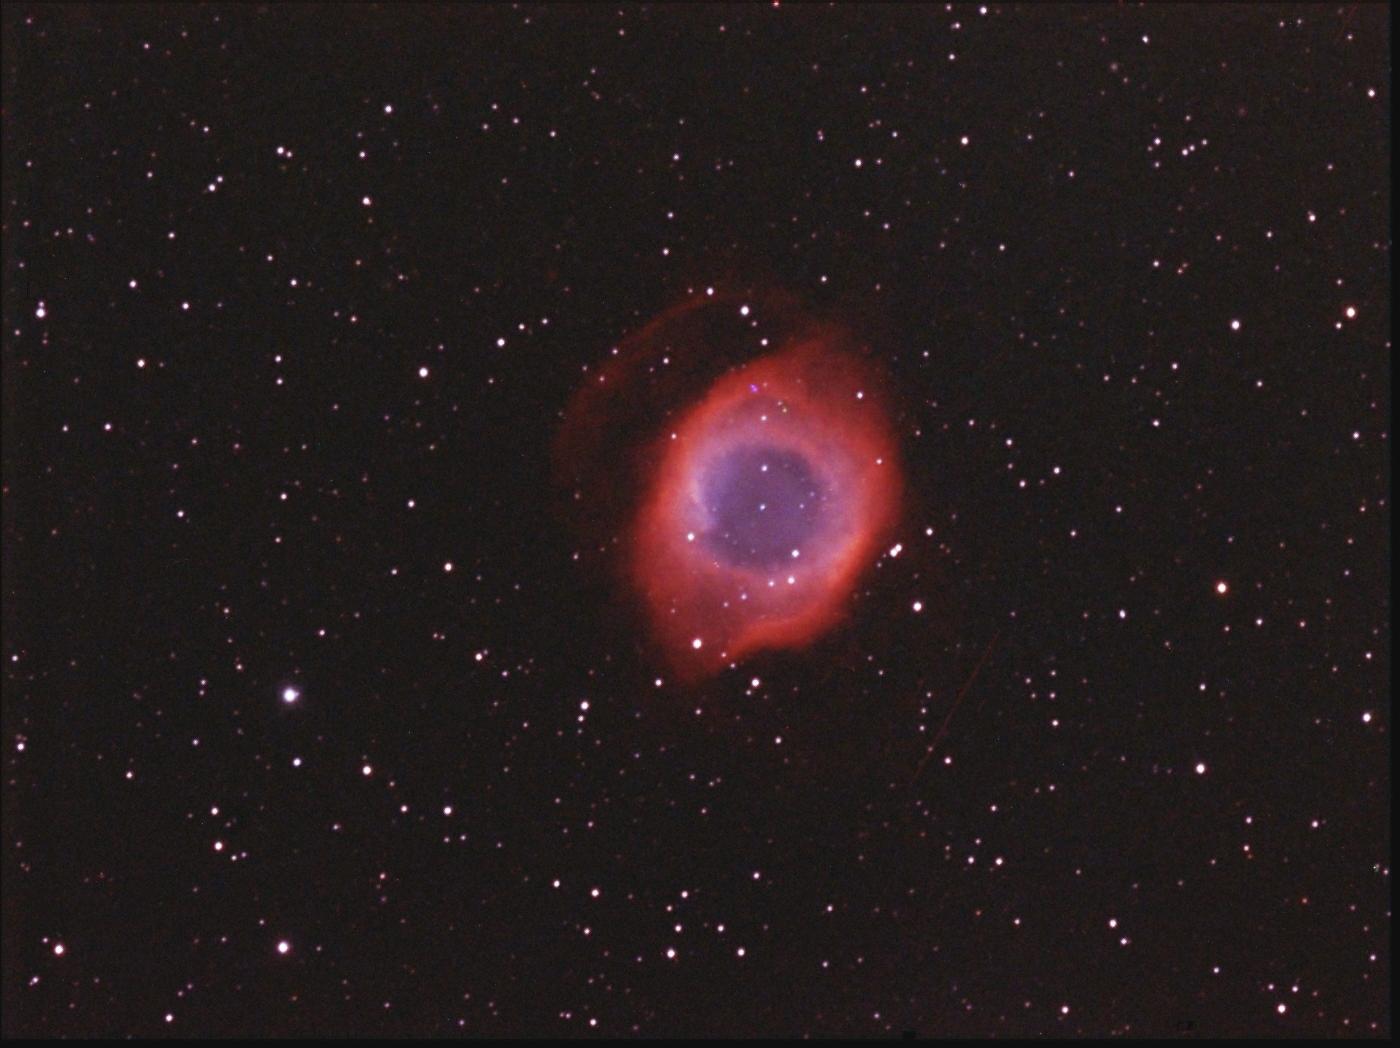 helix nebula constellation aquarius - photo #20